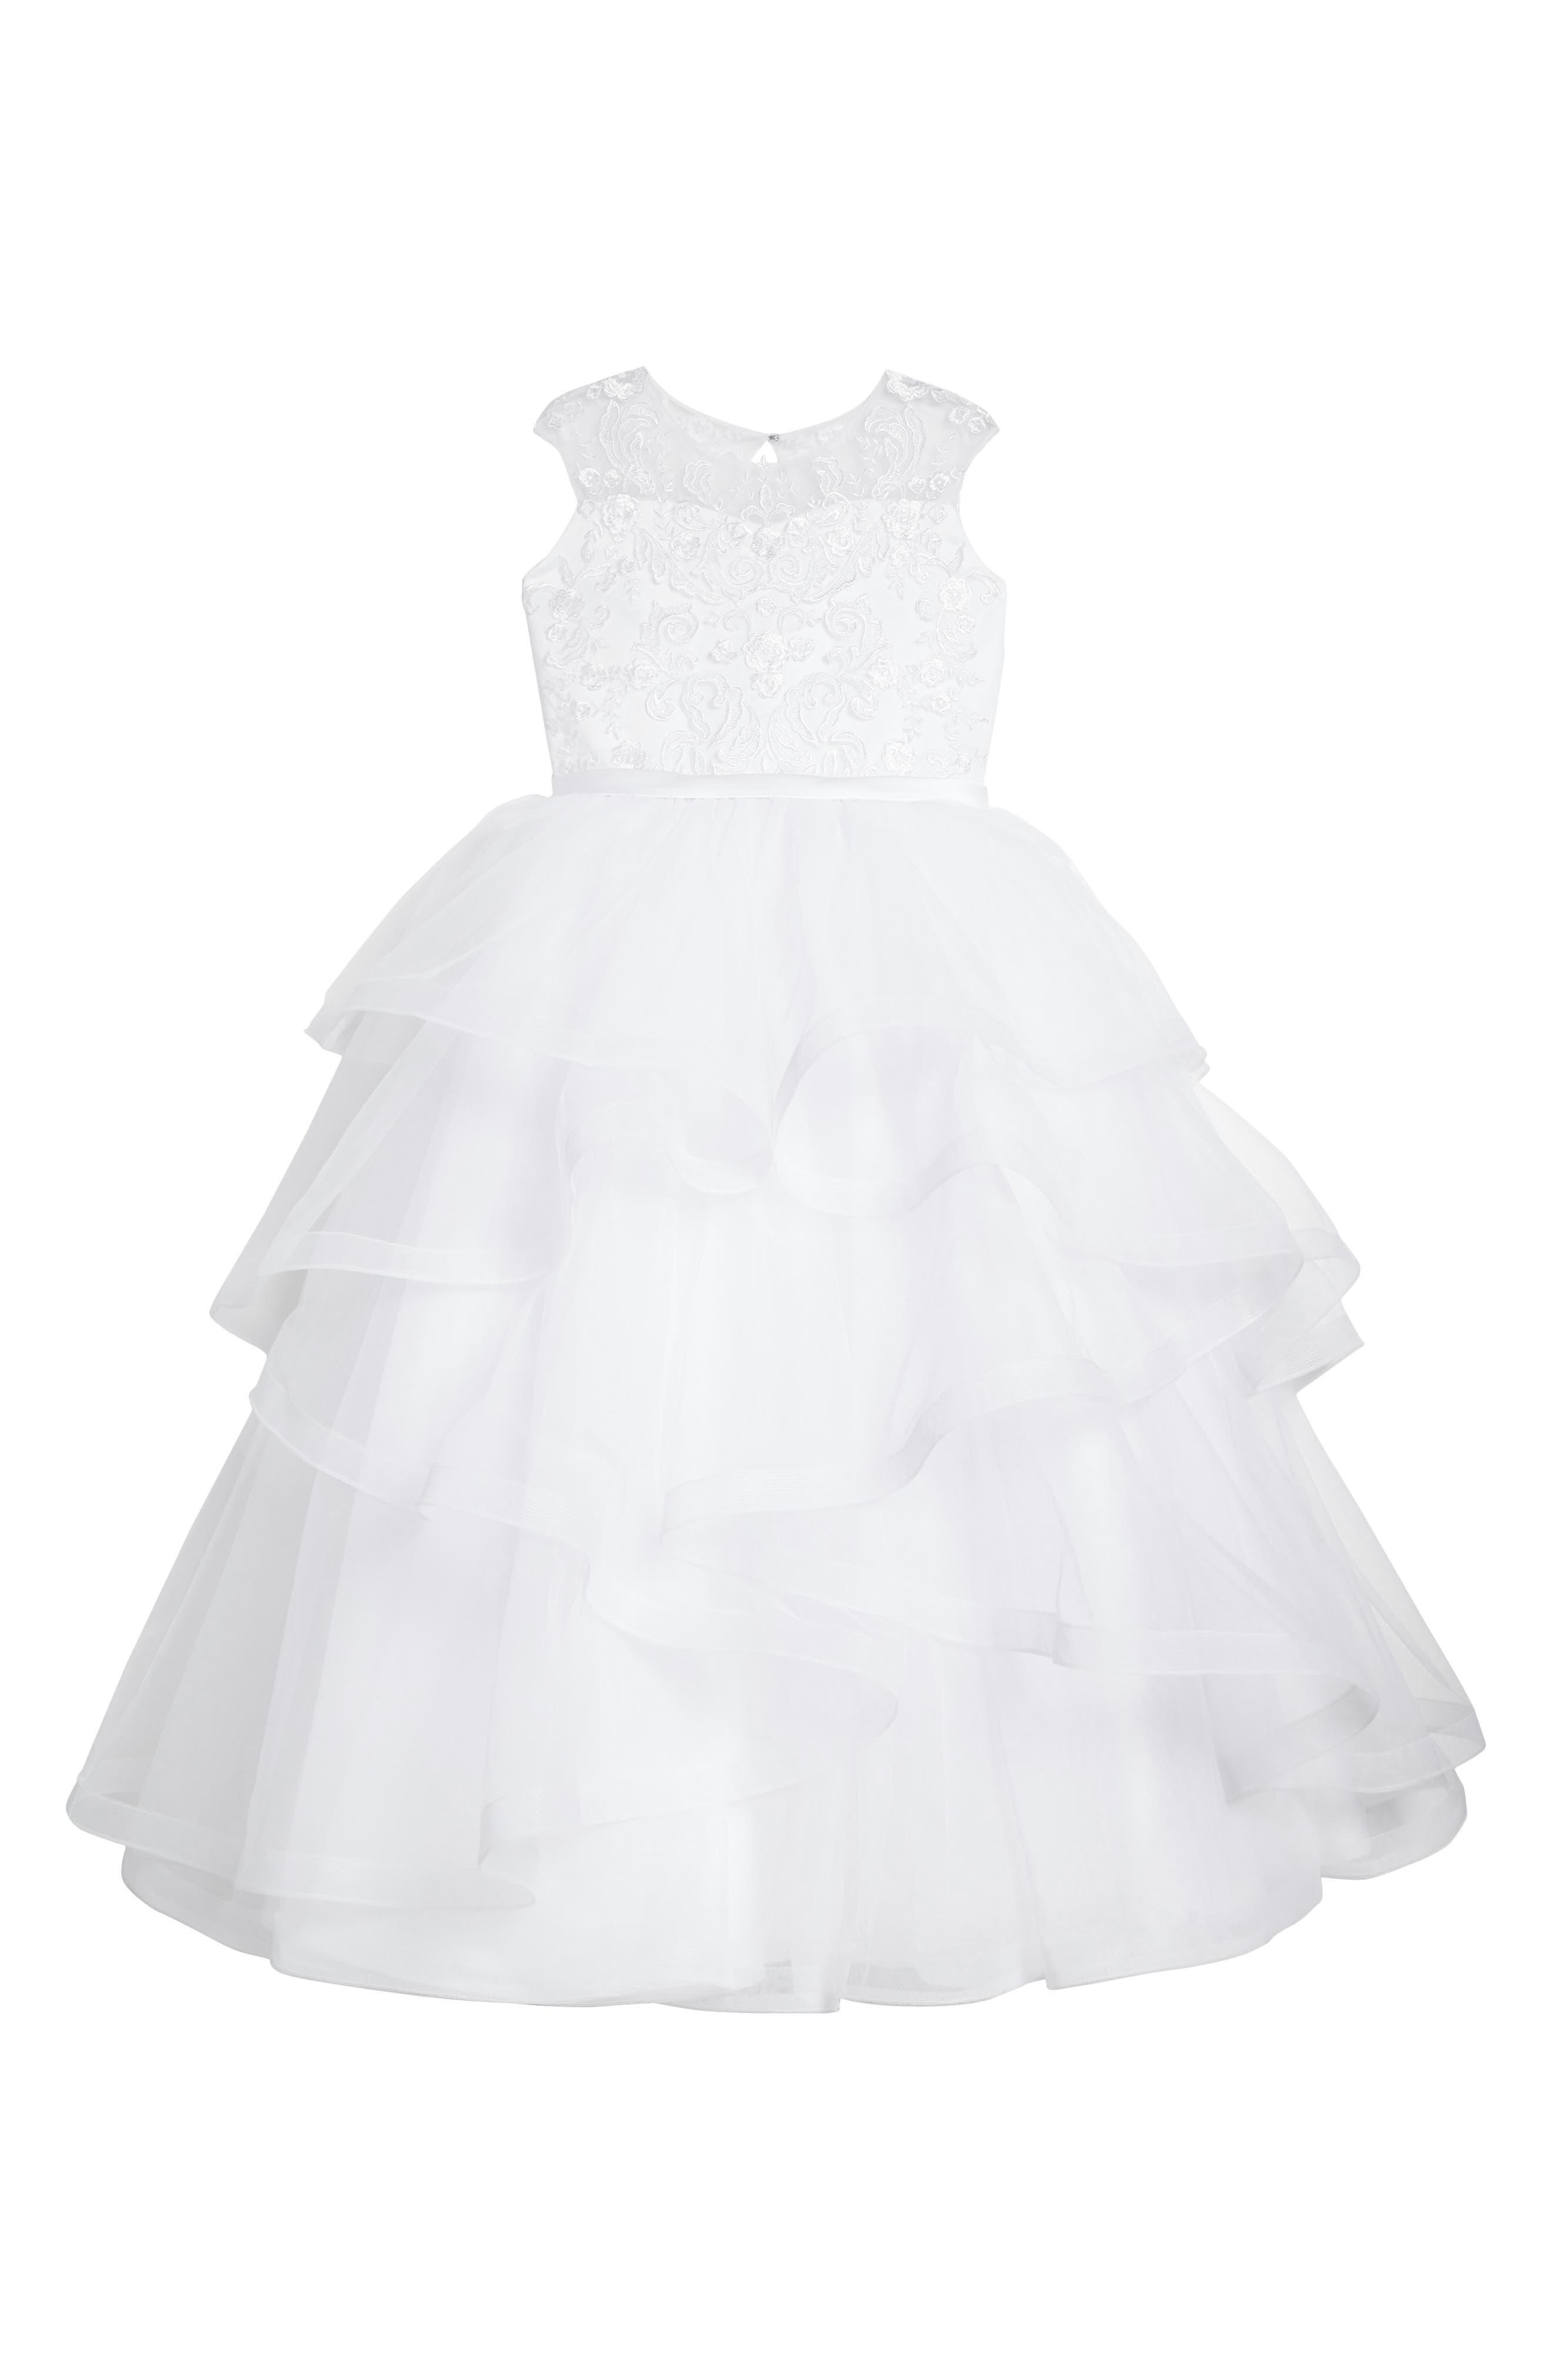 Joan Calabrese for Mon Cheri Tiered First Communion Dress (Little Girls & Big Girls)